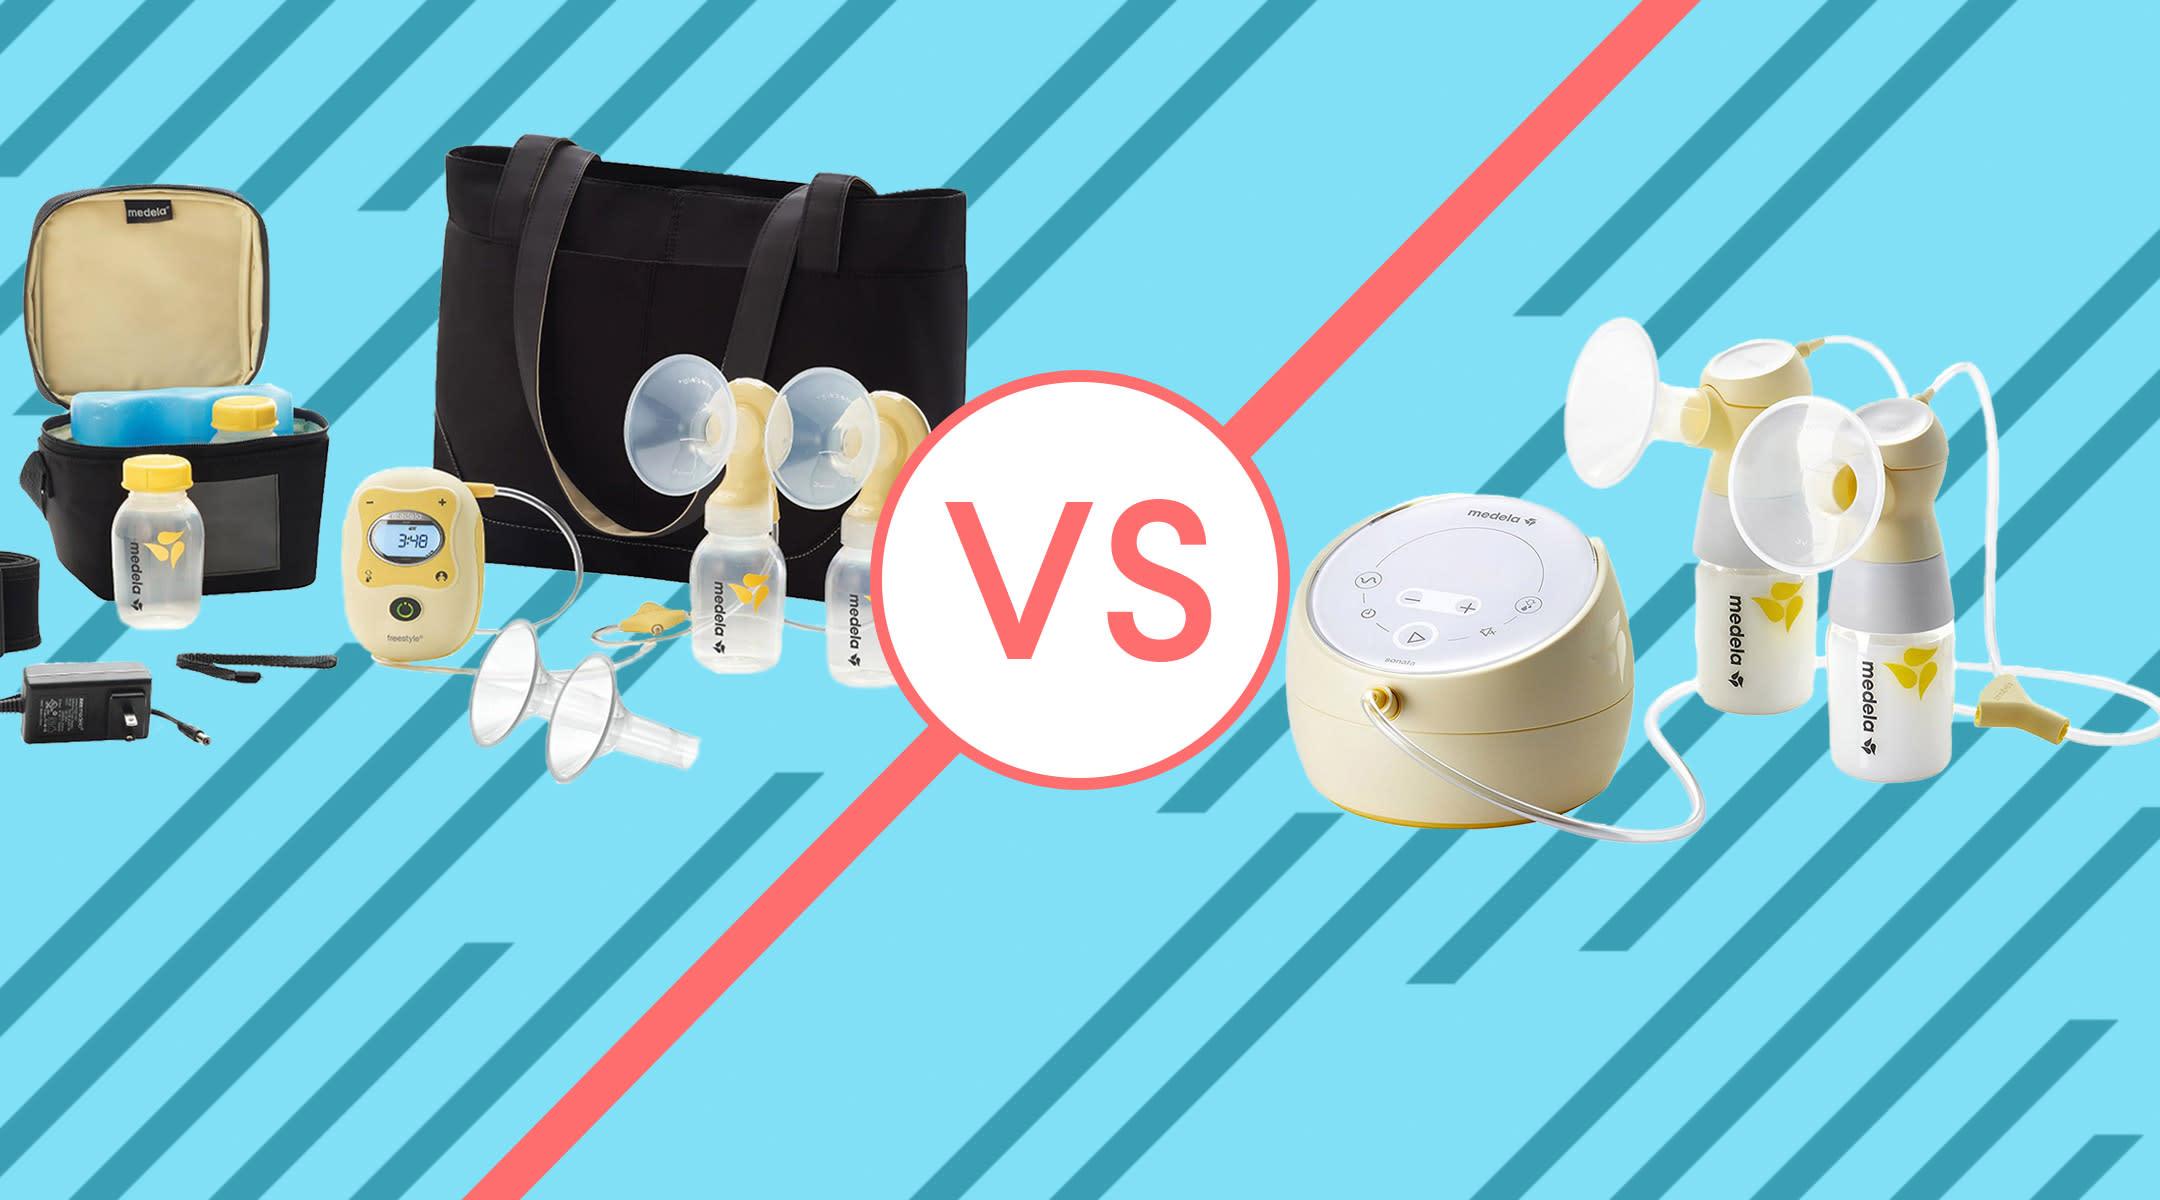 review of medela freestyle breast pump versus medela sonata